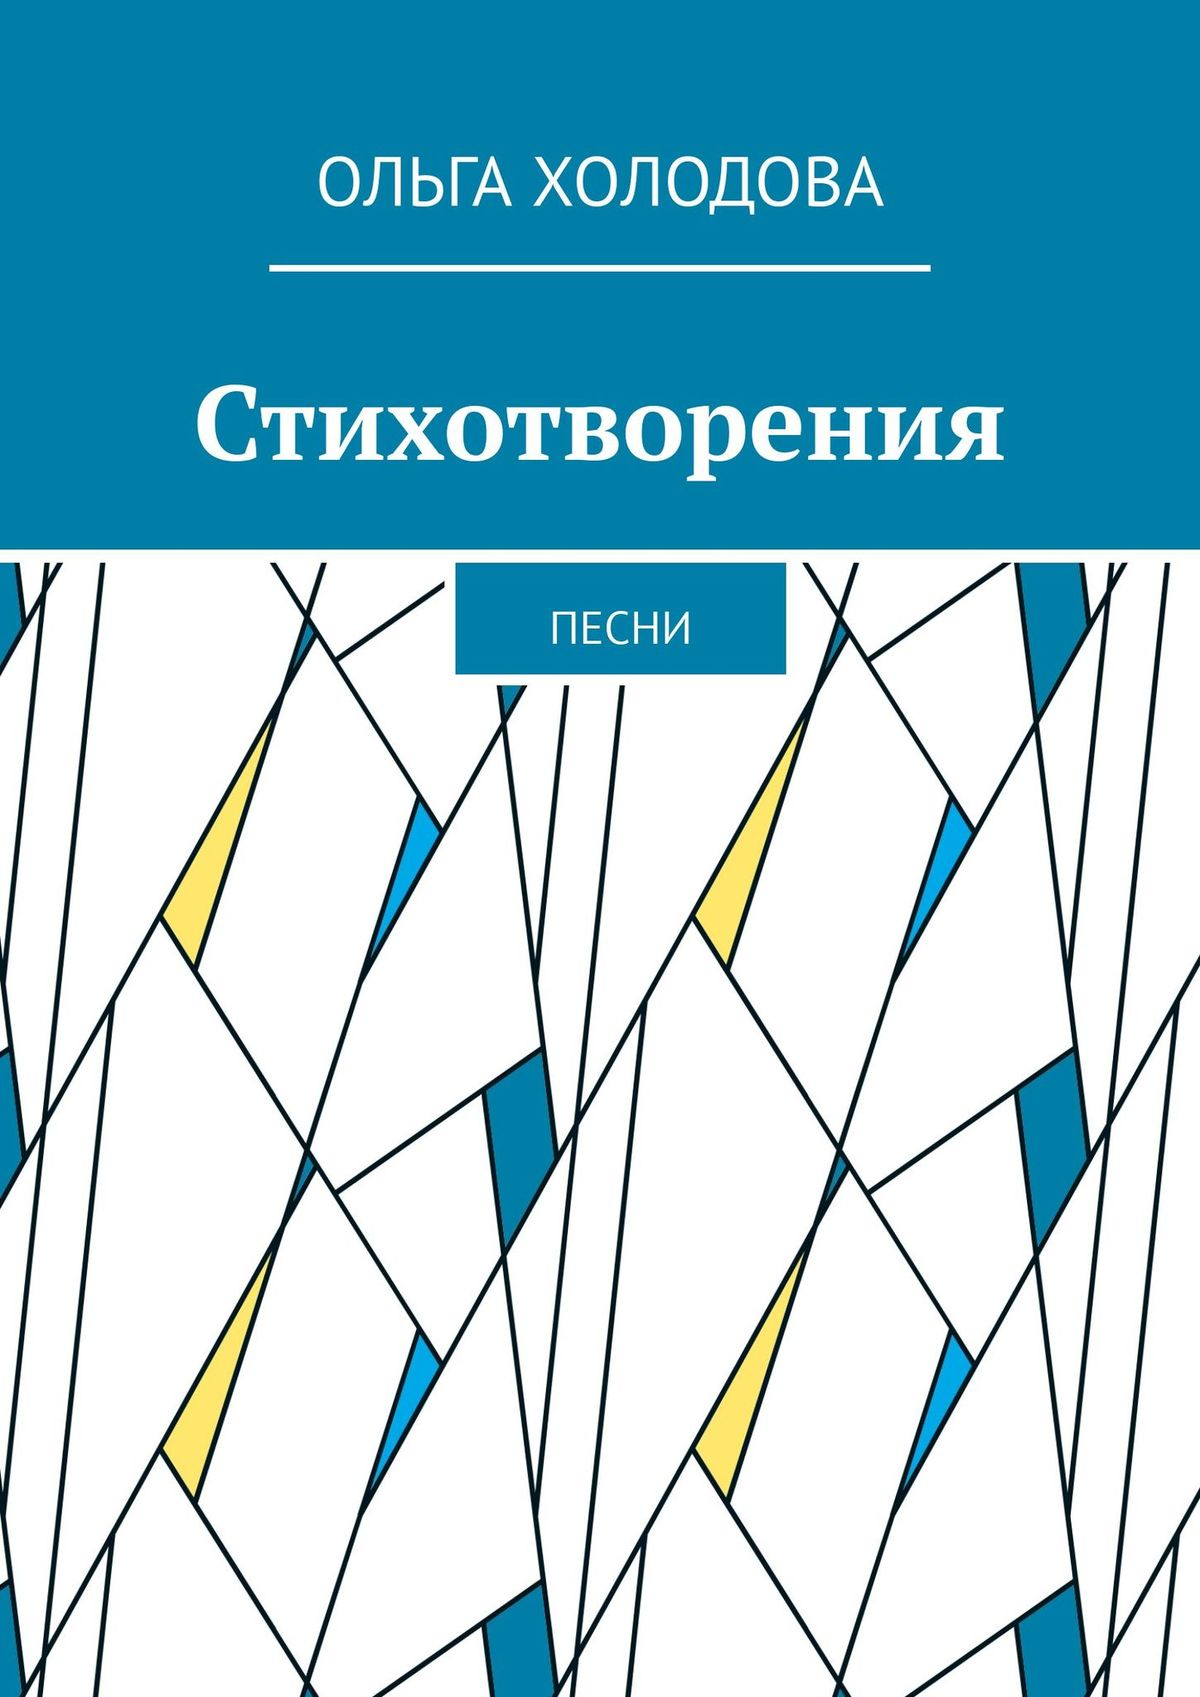 Ольга Холодова Стихотворения. Песни